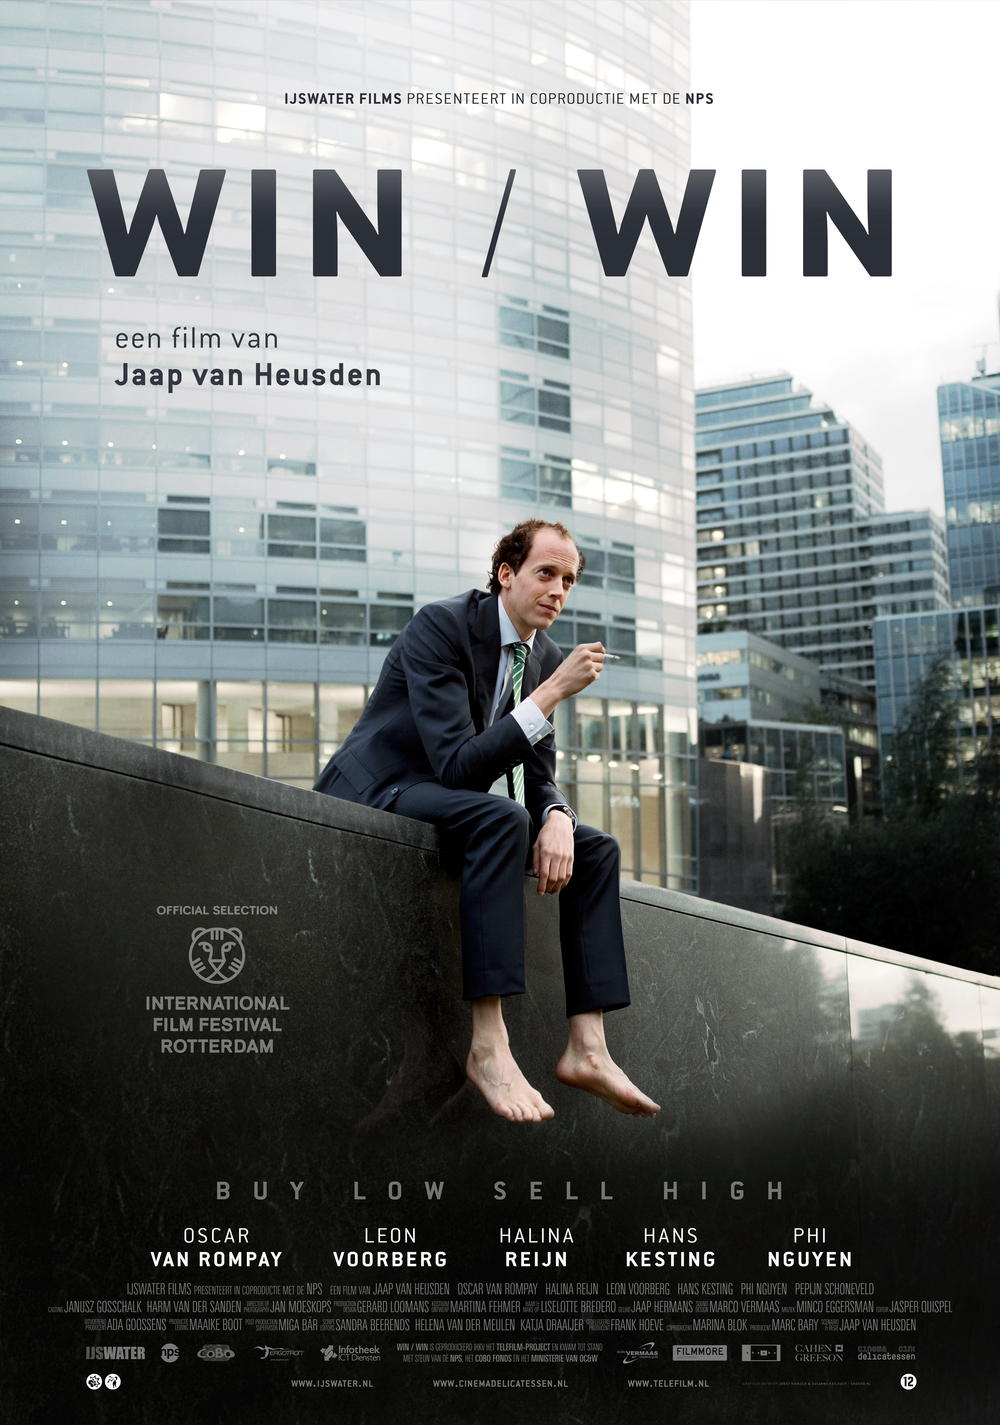 A4-Win-Win.jpg